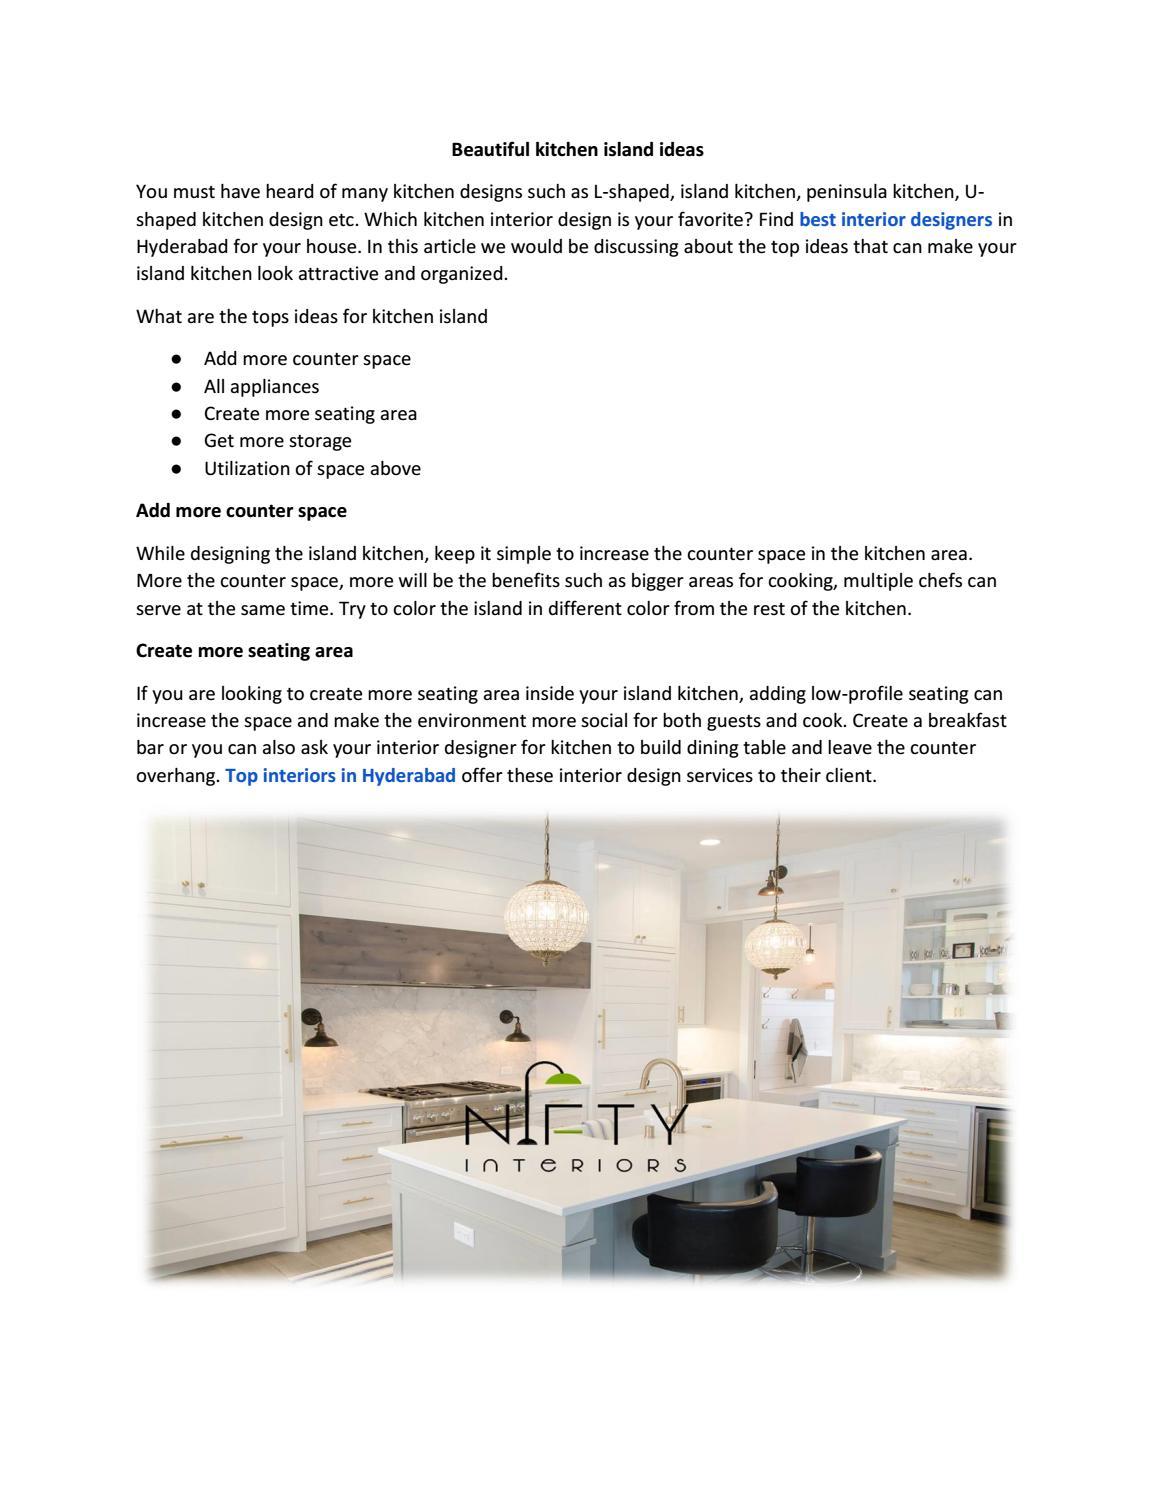 Beautiful kitchen island ideas by niftyinterio   issuu